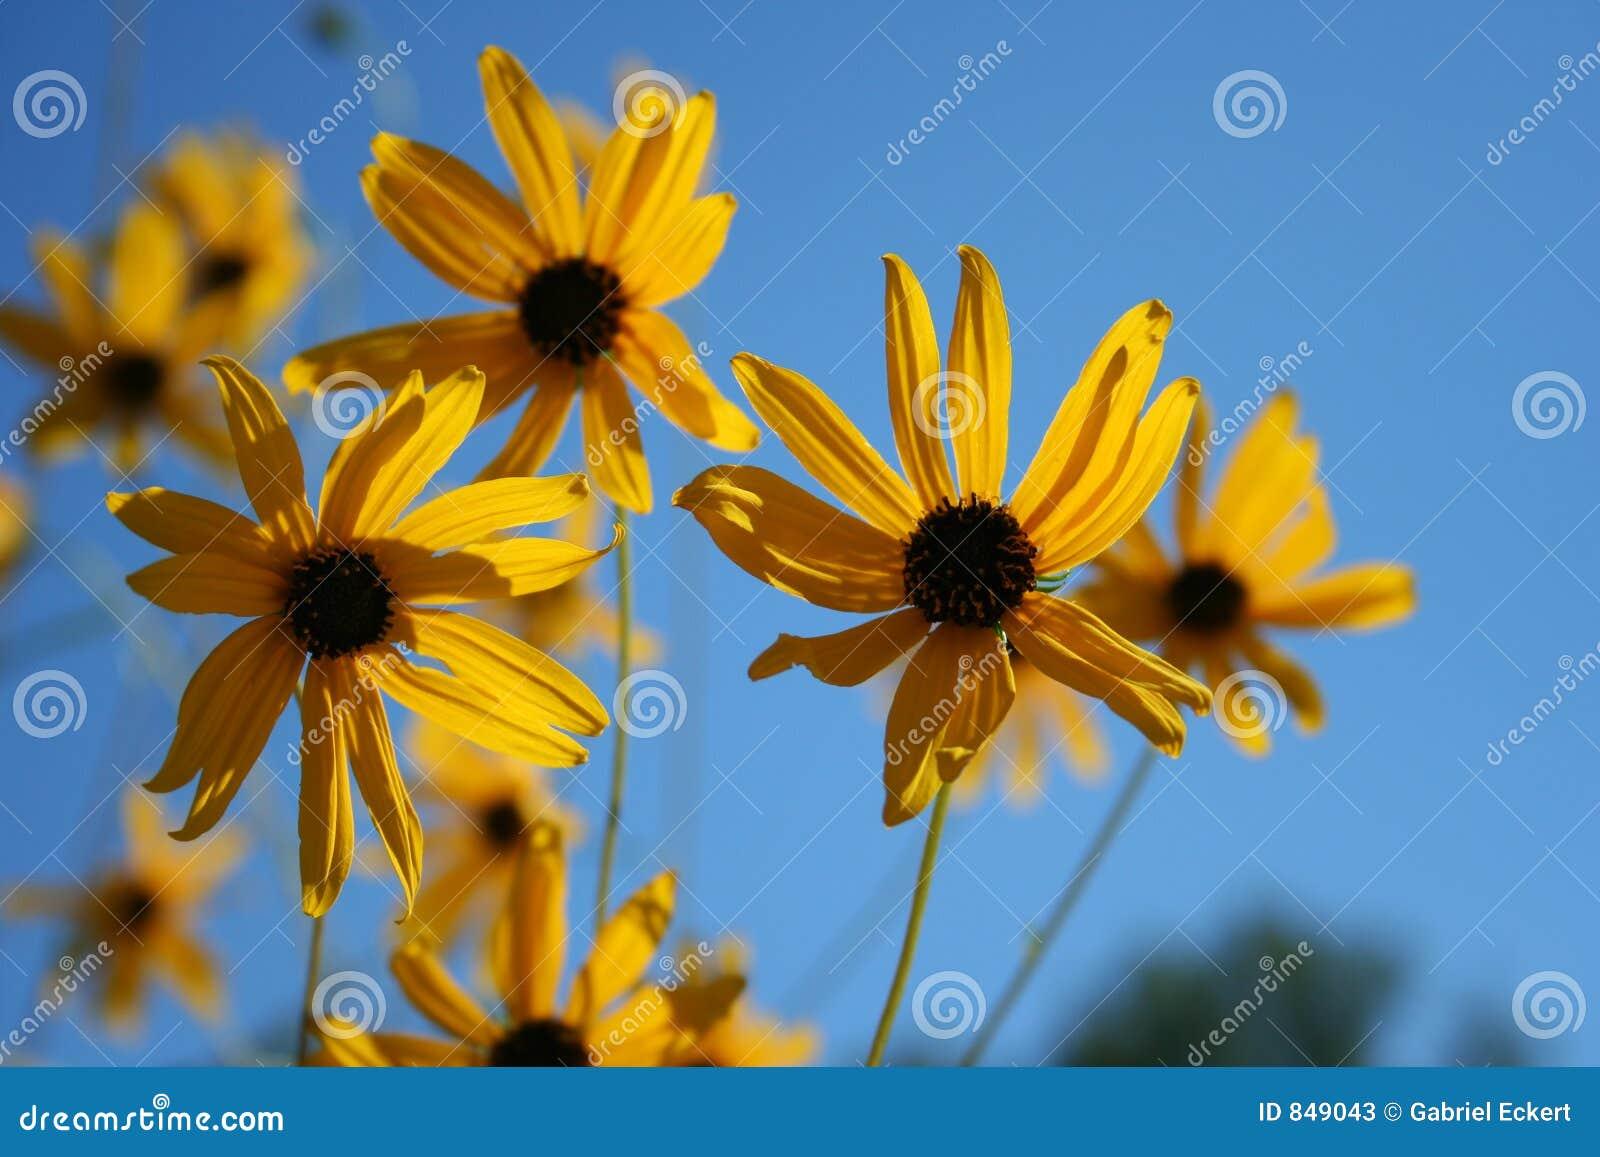 Sun-light flowers